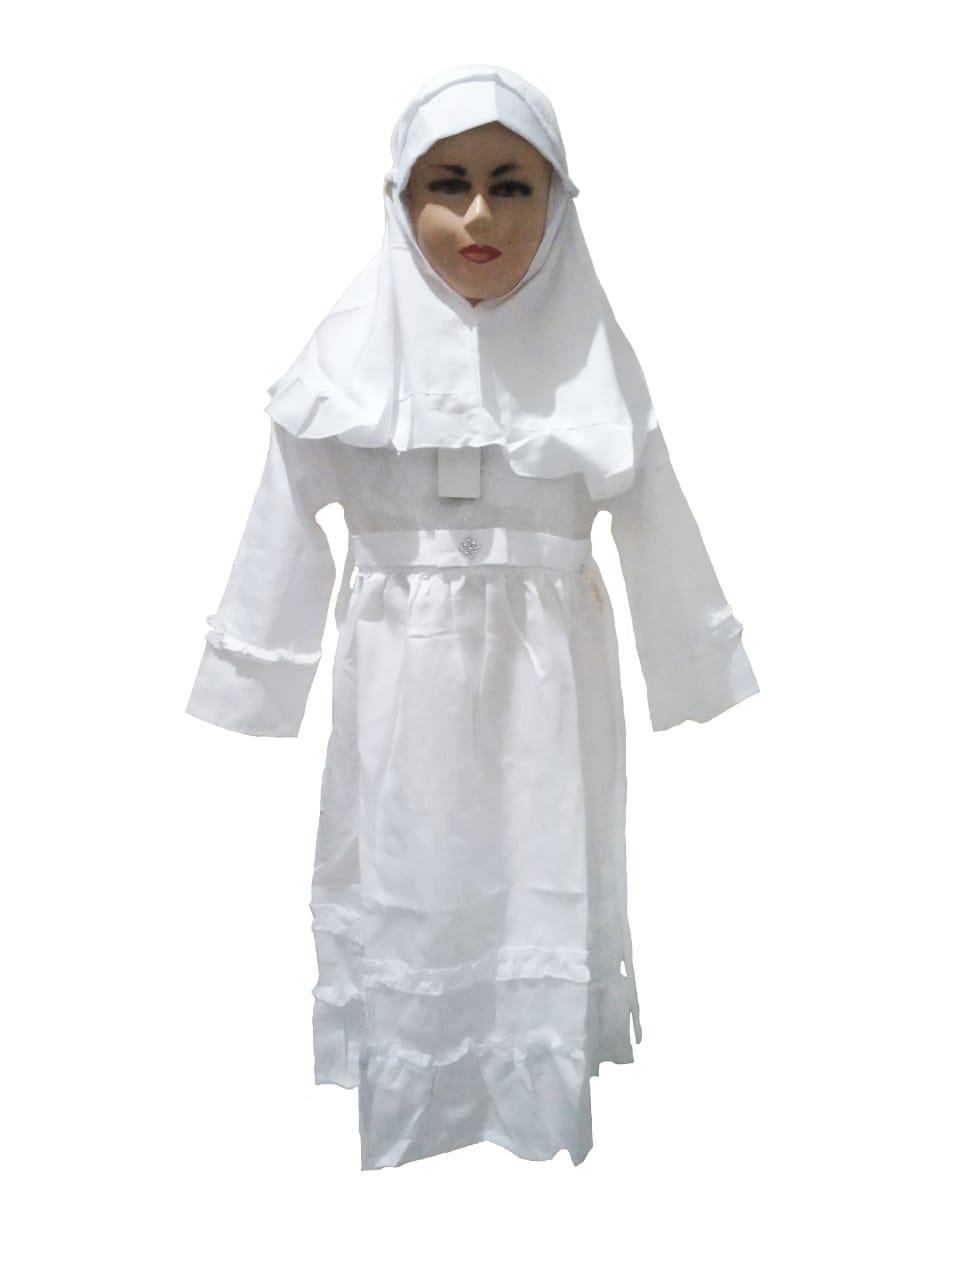 740 Koleksi Model Baju Batik Anak Perempuan Lucu HD